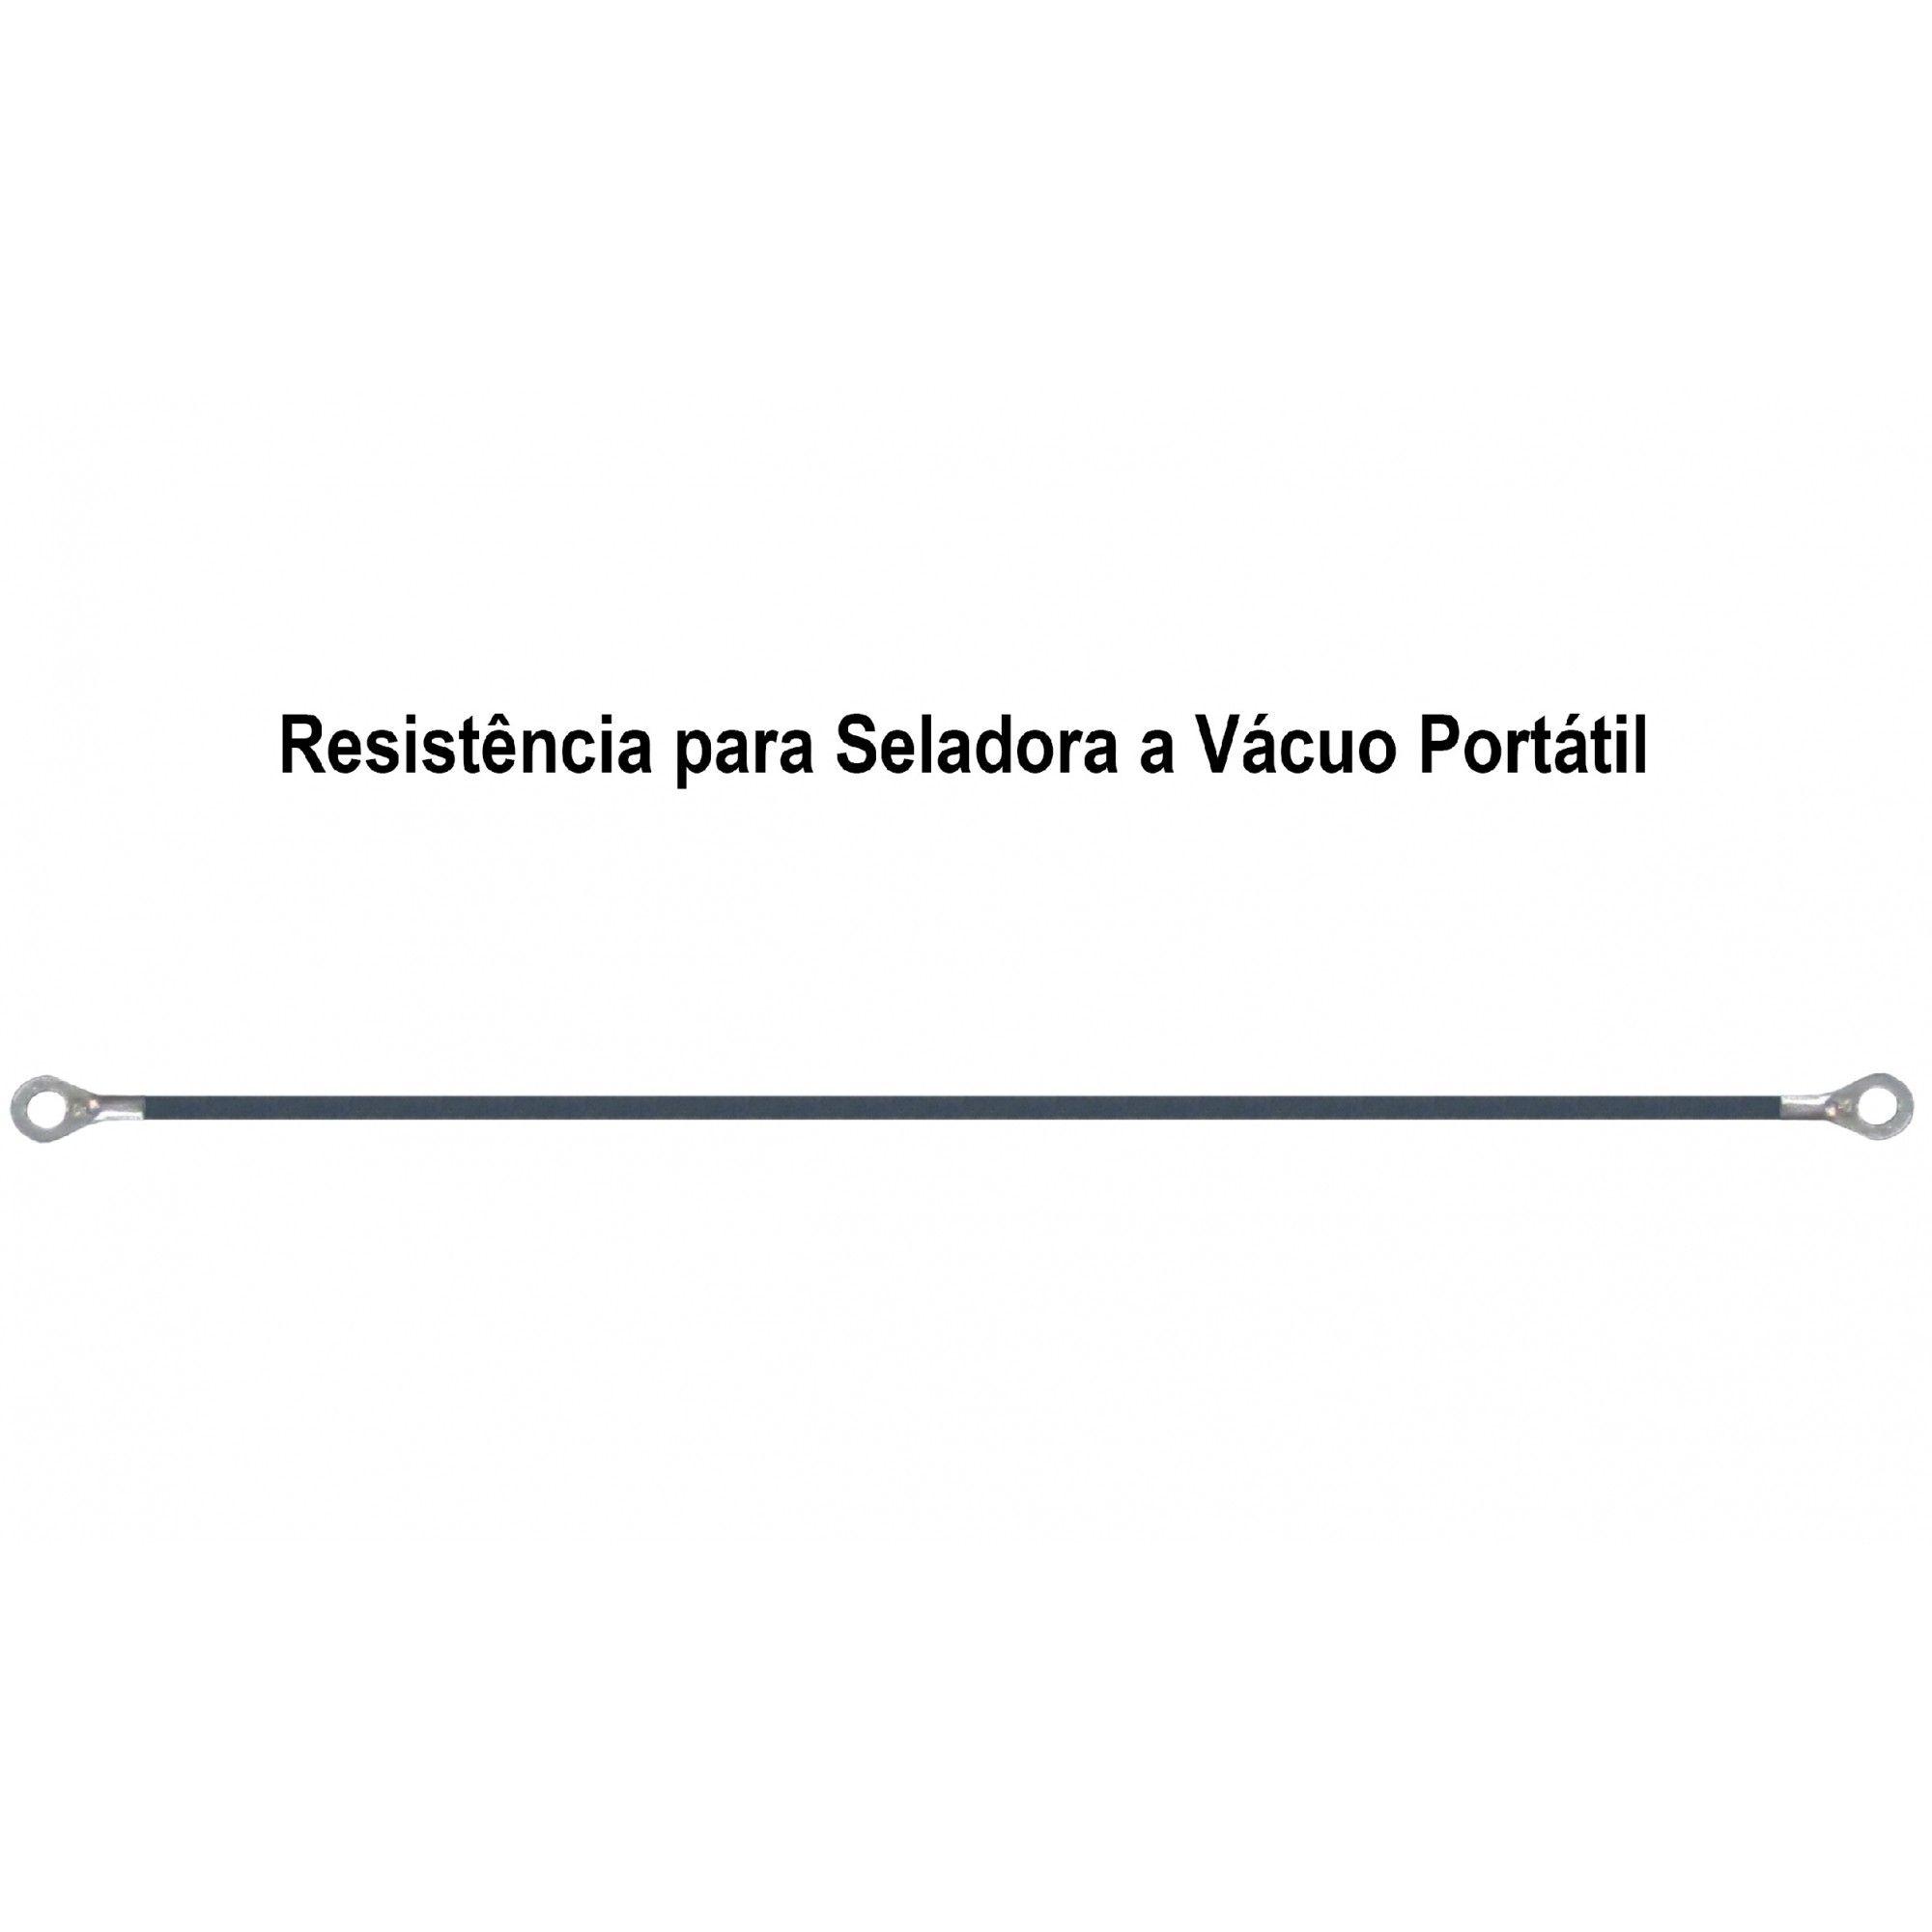 Resistência Seladora a Vácuo Portátil RG-300A / RG-300B / RG-300PLUS